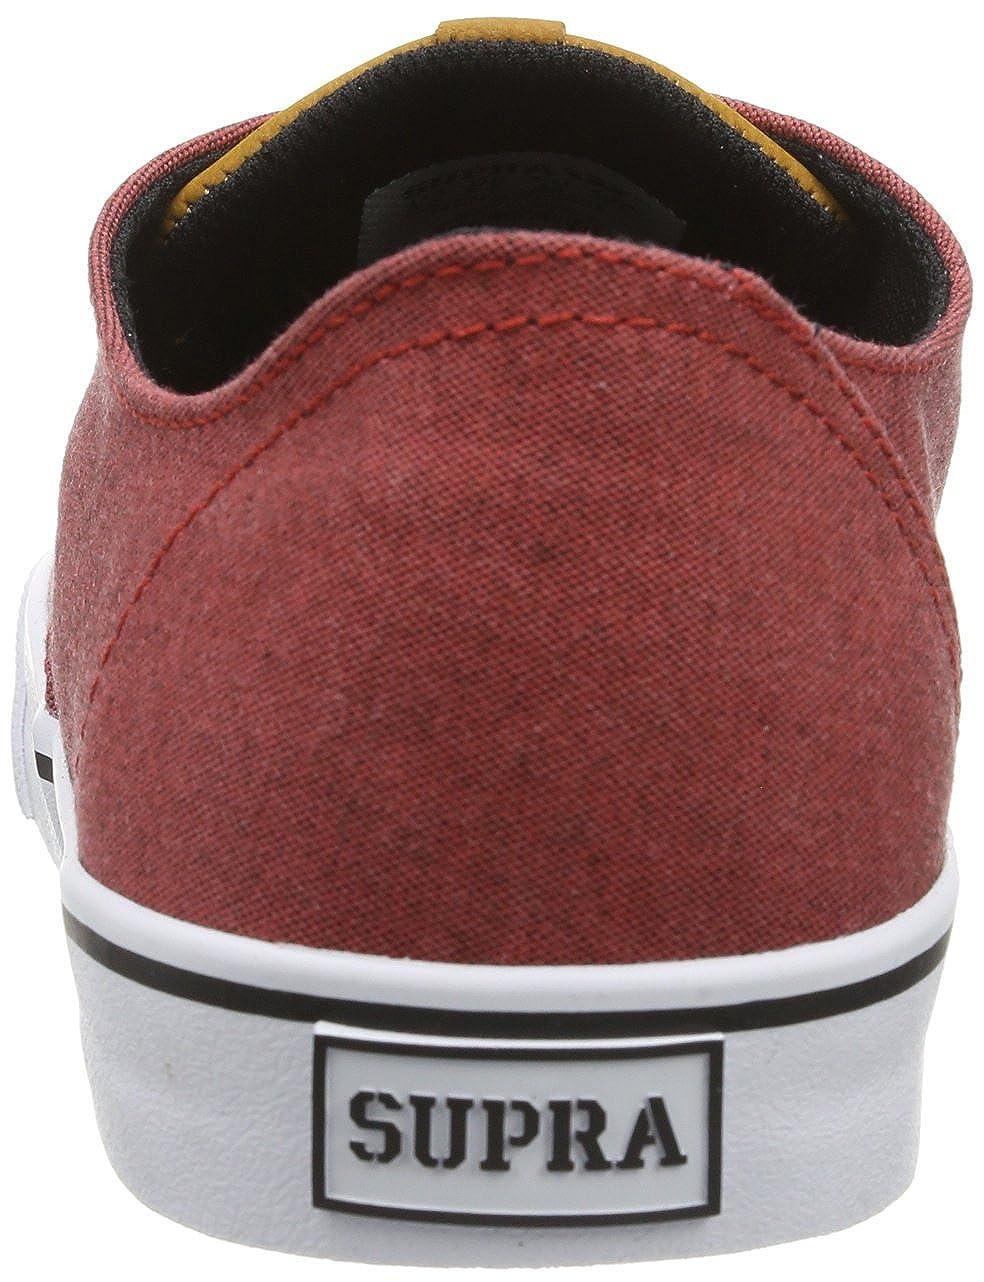 Supra WRAP S05039 Unisex Erwachsene SneakerRot (ROT Spice Spice (ROT Weiß ... ada9c3